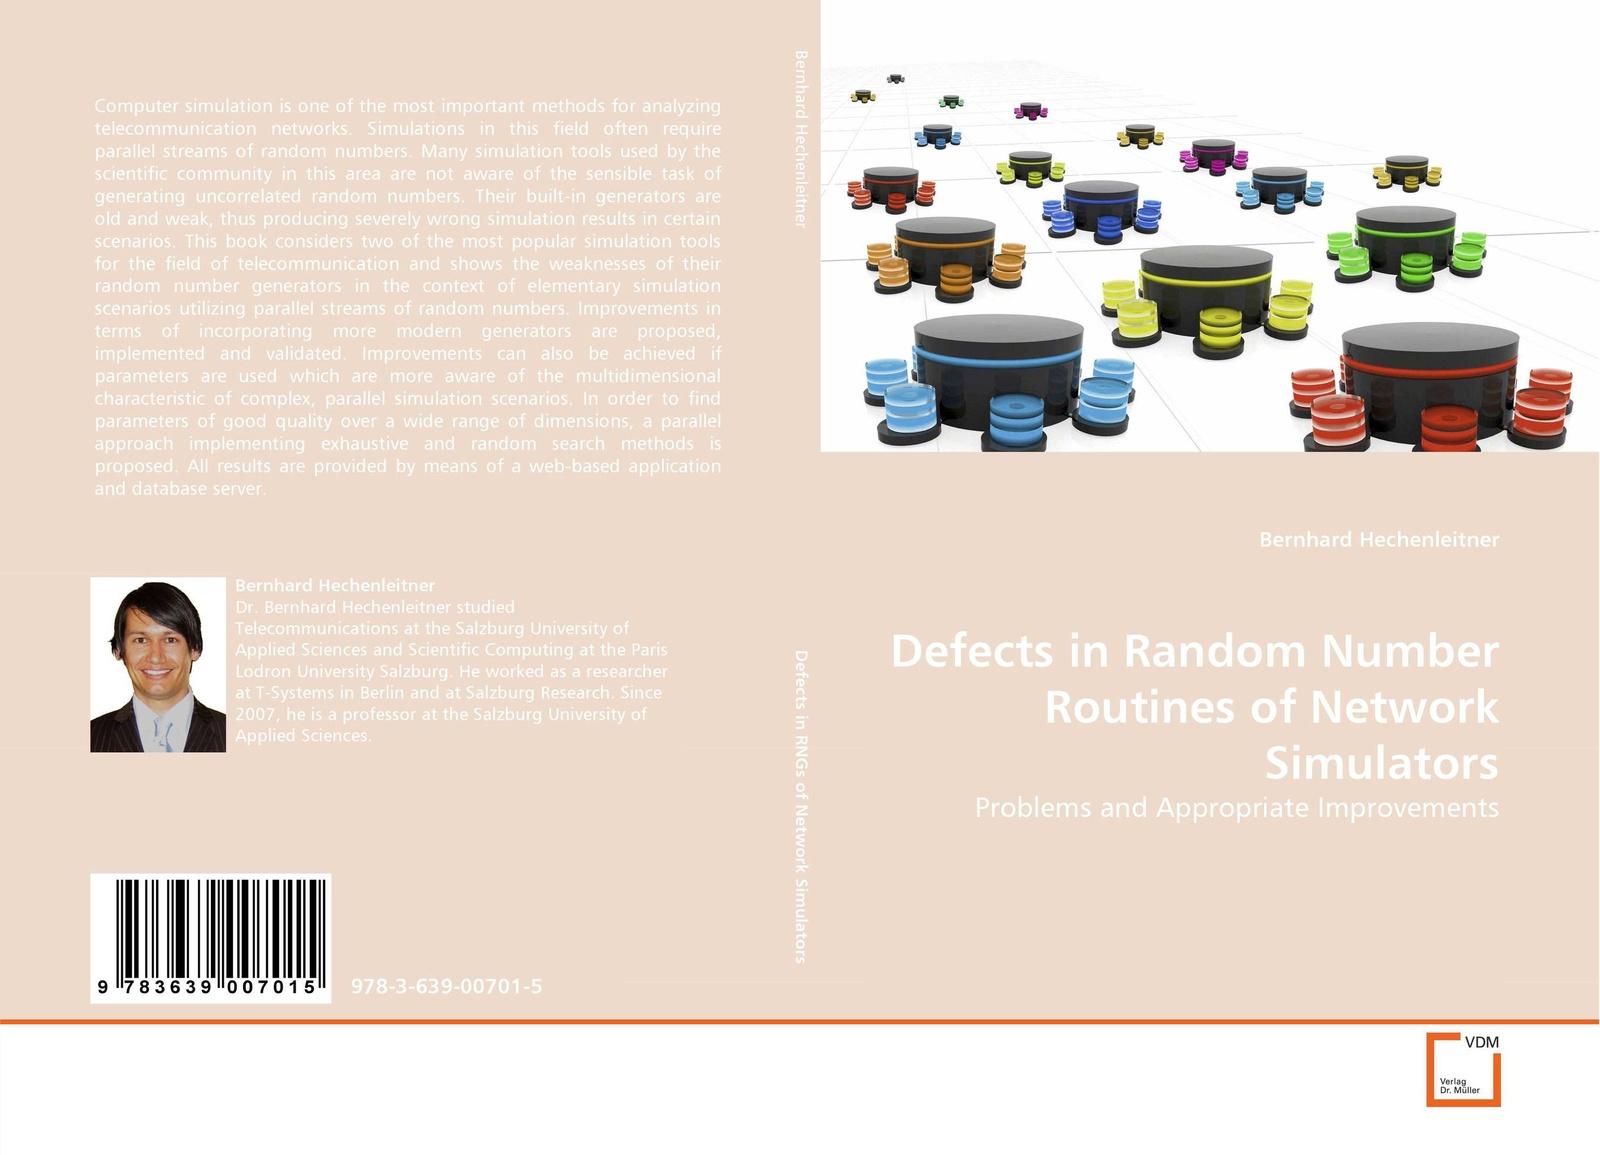 Bernhard Hechenleitner Defects in Random Number Routines of Network Simulators